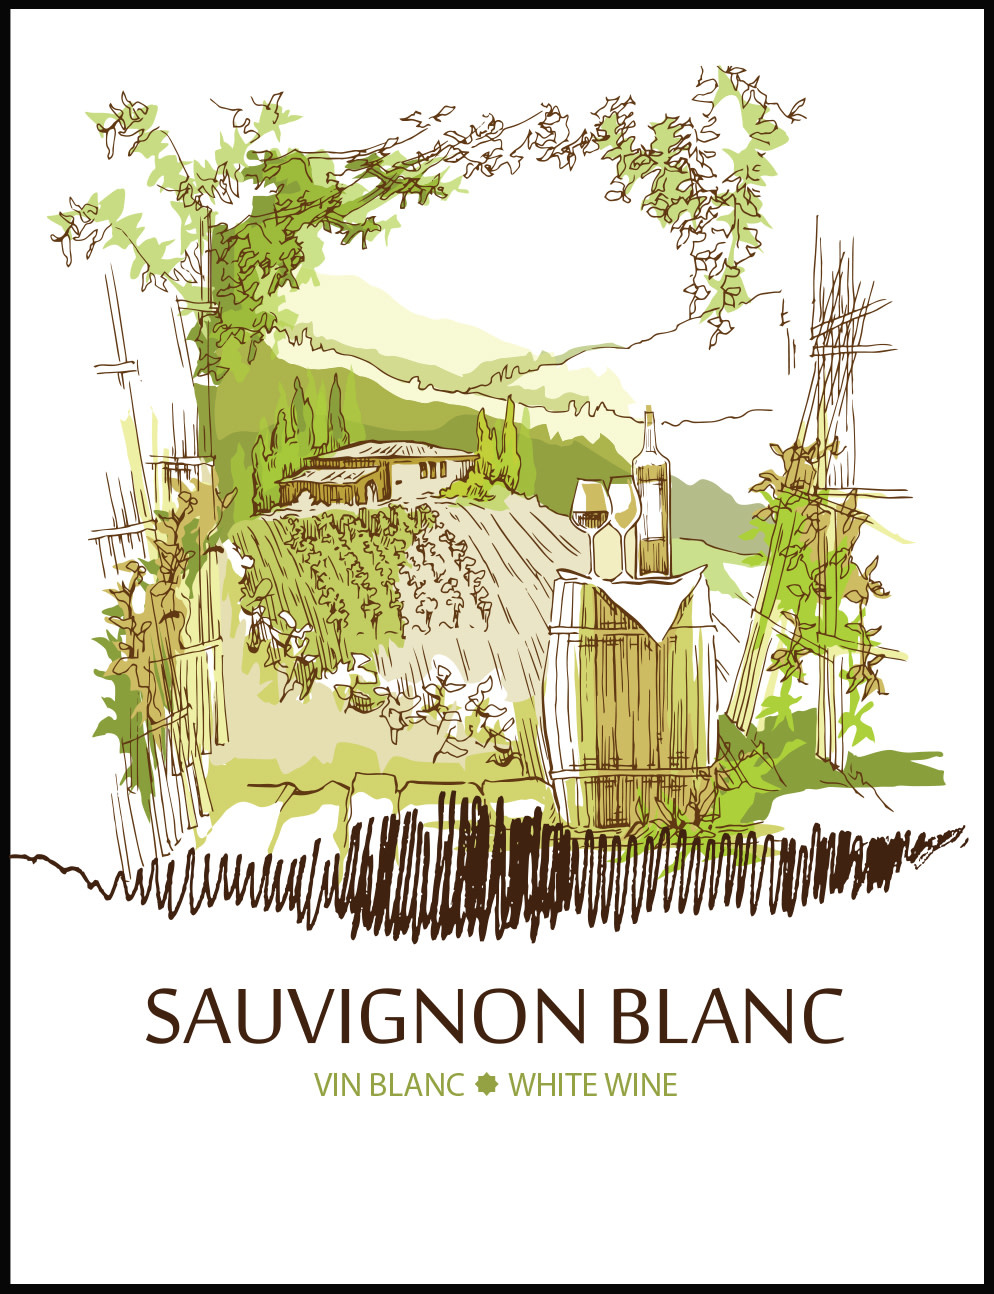 LD Carlson Wine Labels 30 Count (Sauvignon Blanc)